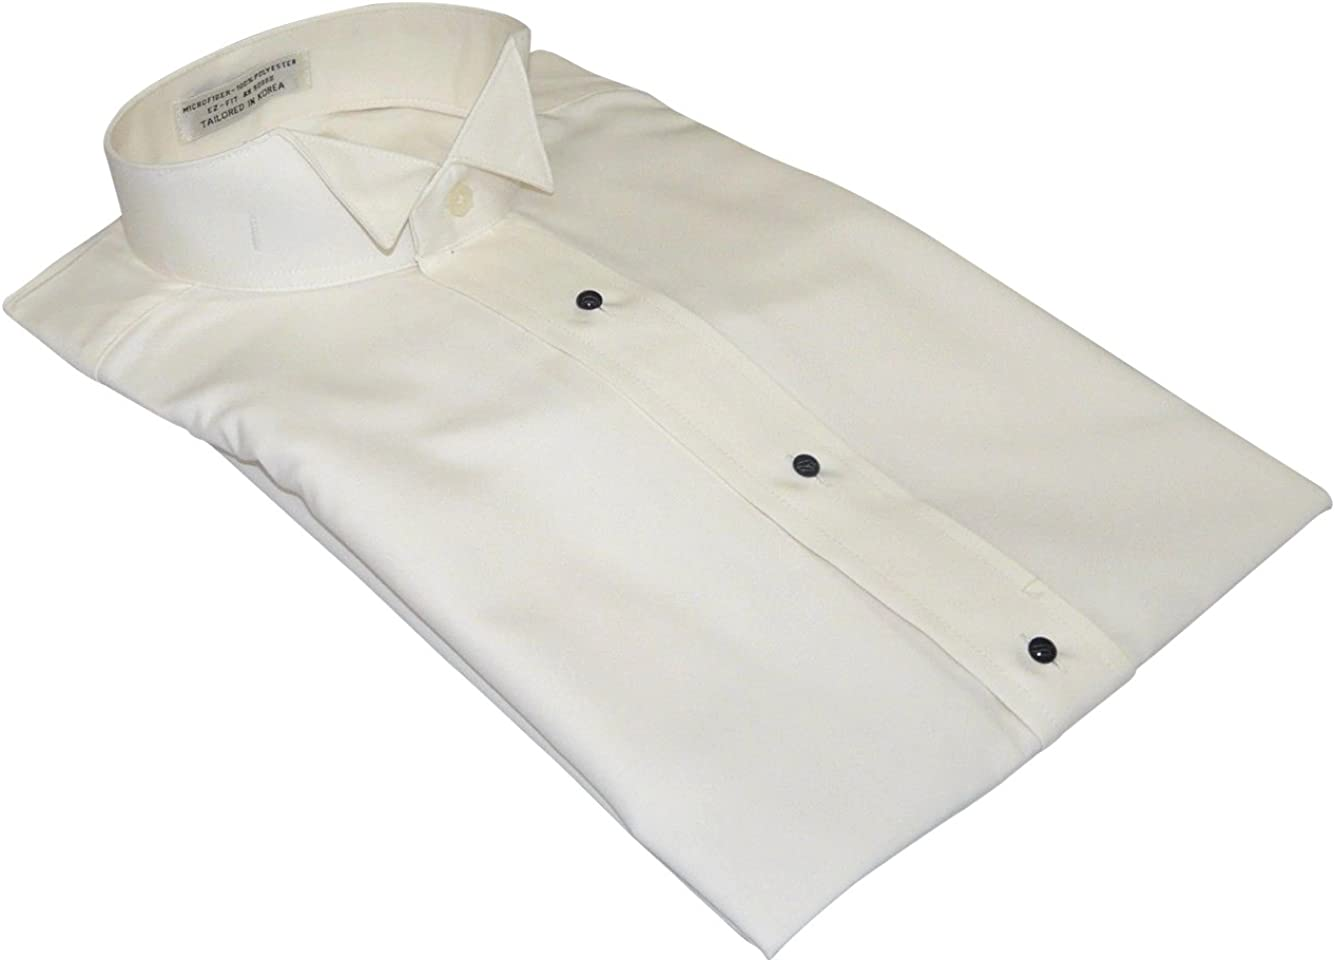 Big and Tall Wing Collar Premium Microfiber Luxury Tuxedo Formal Shirt